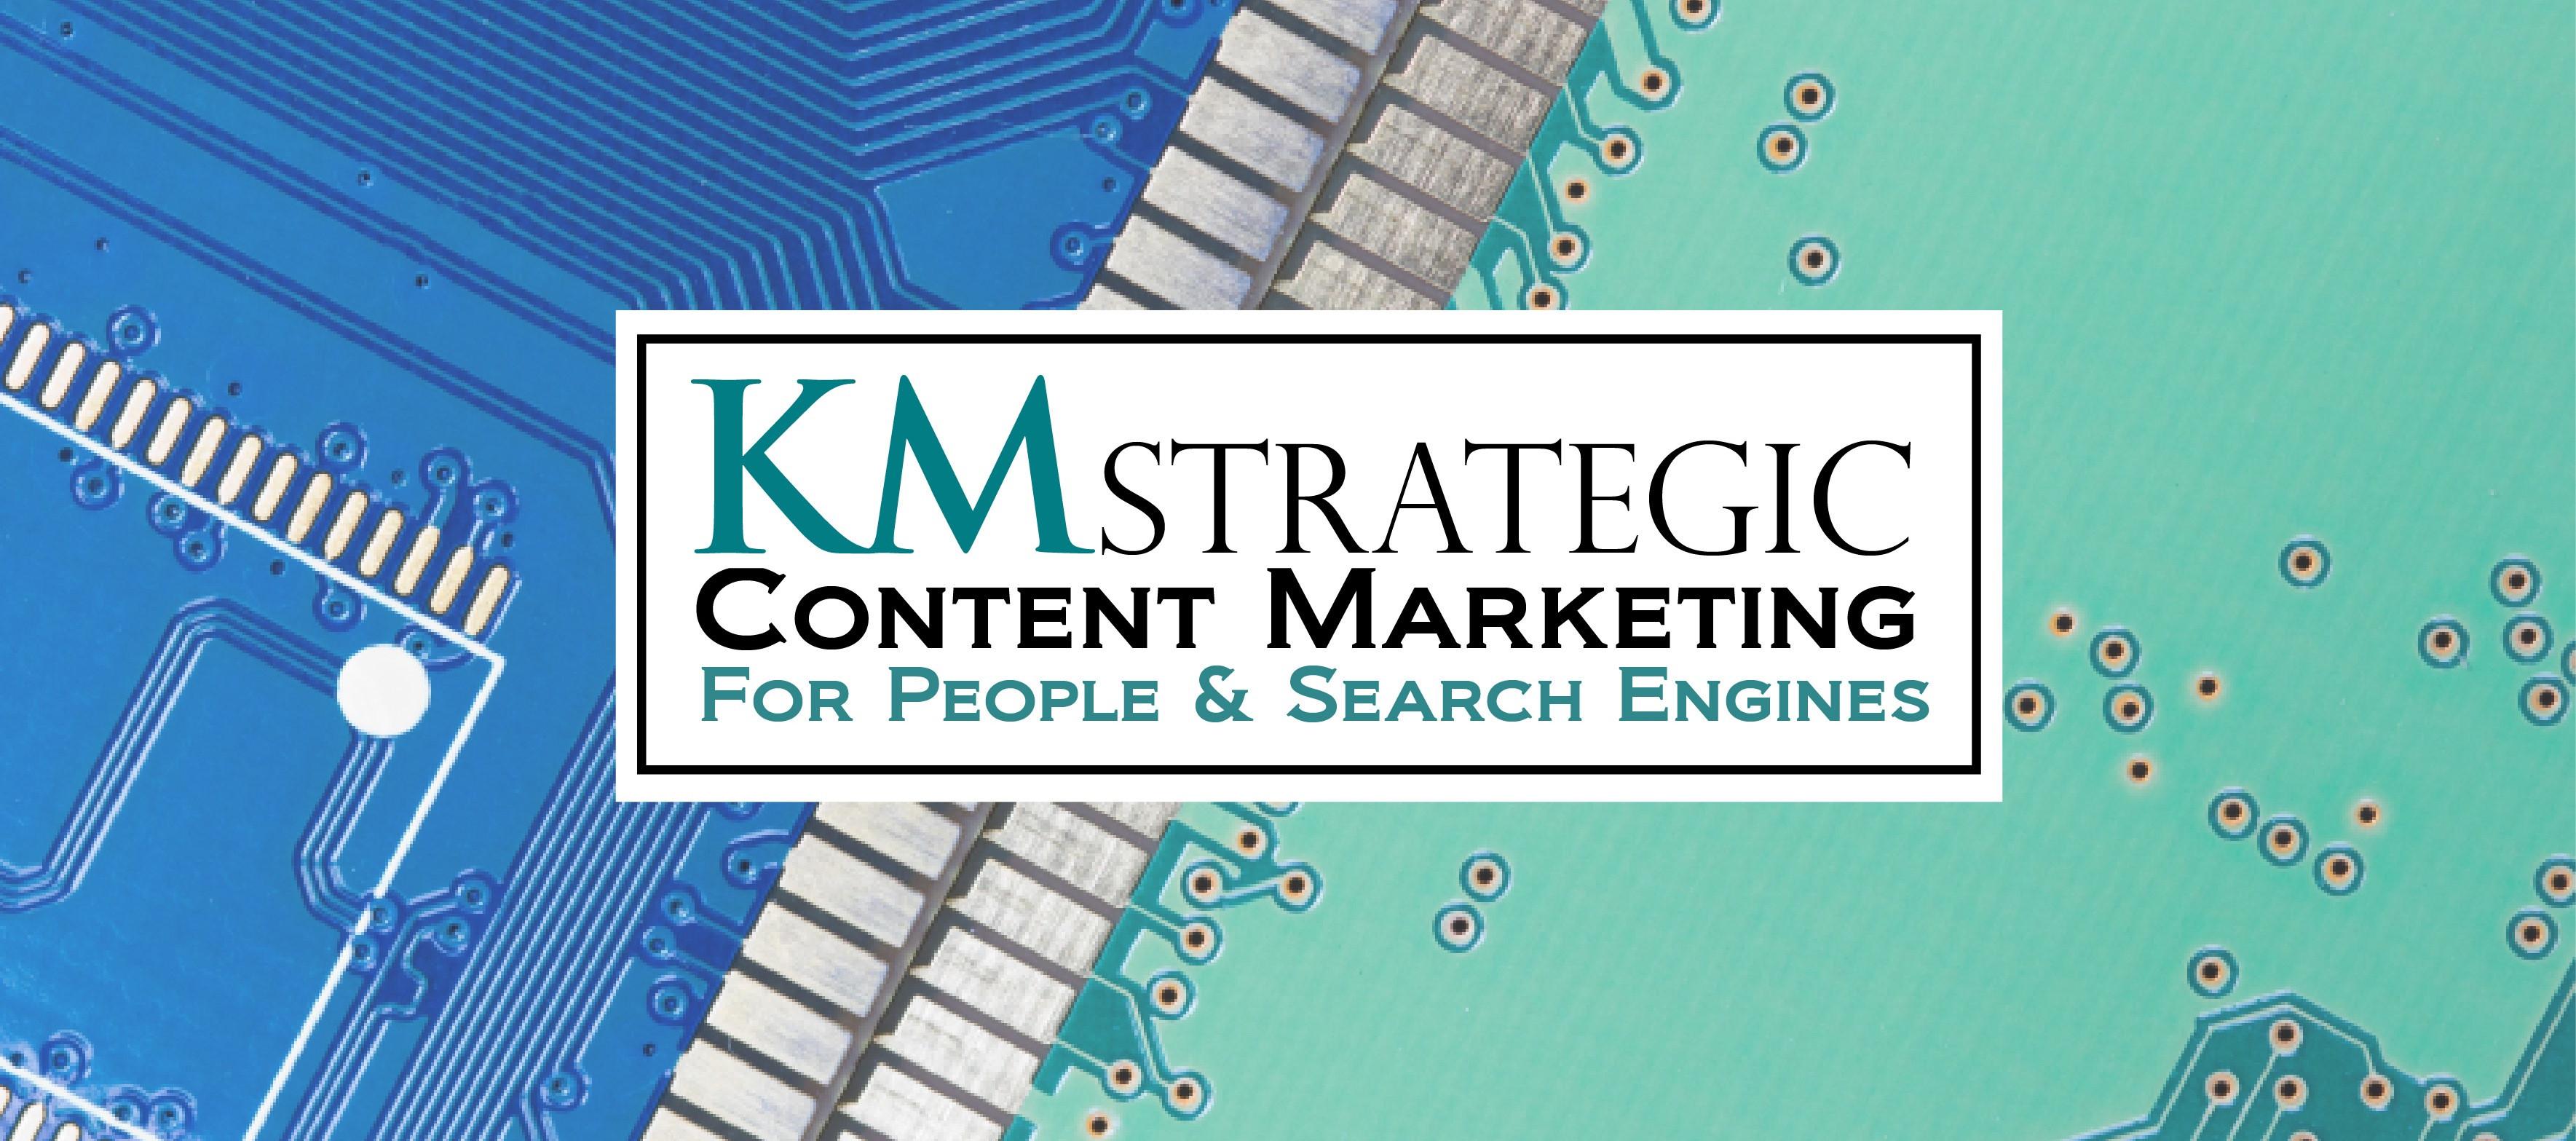 KM Strategic Content Marketing